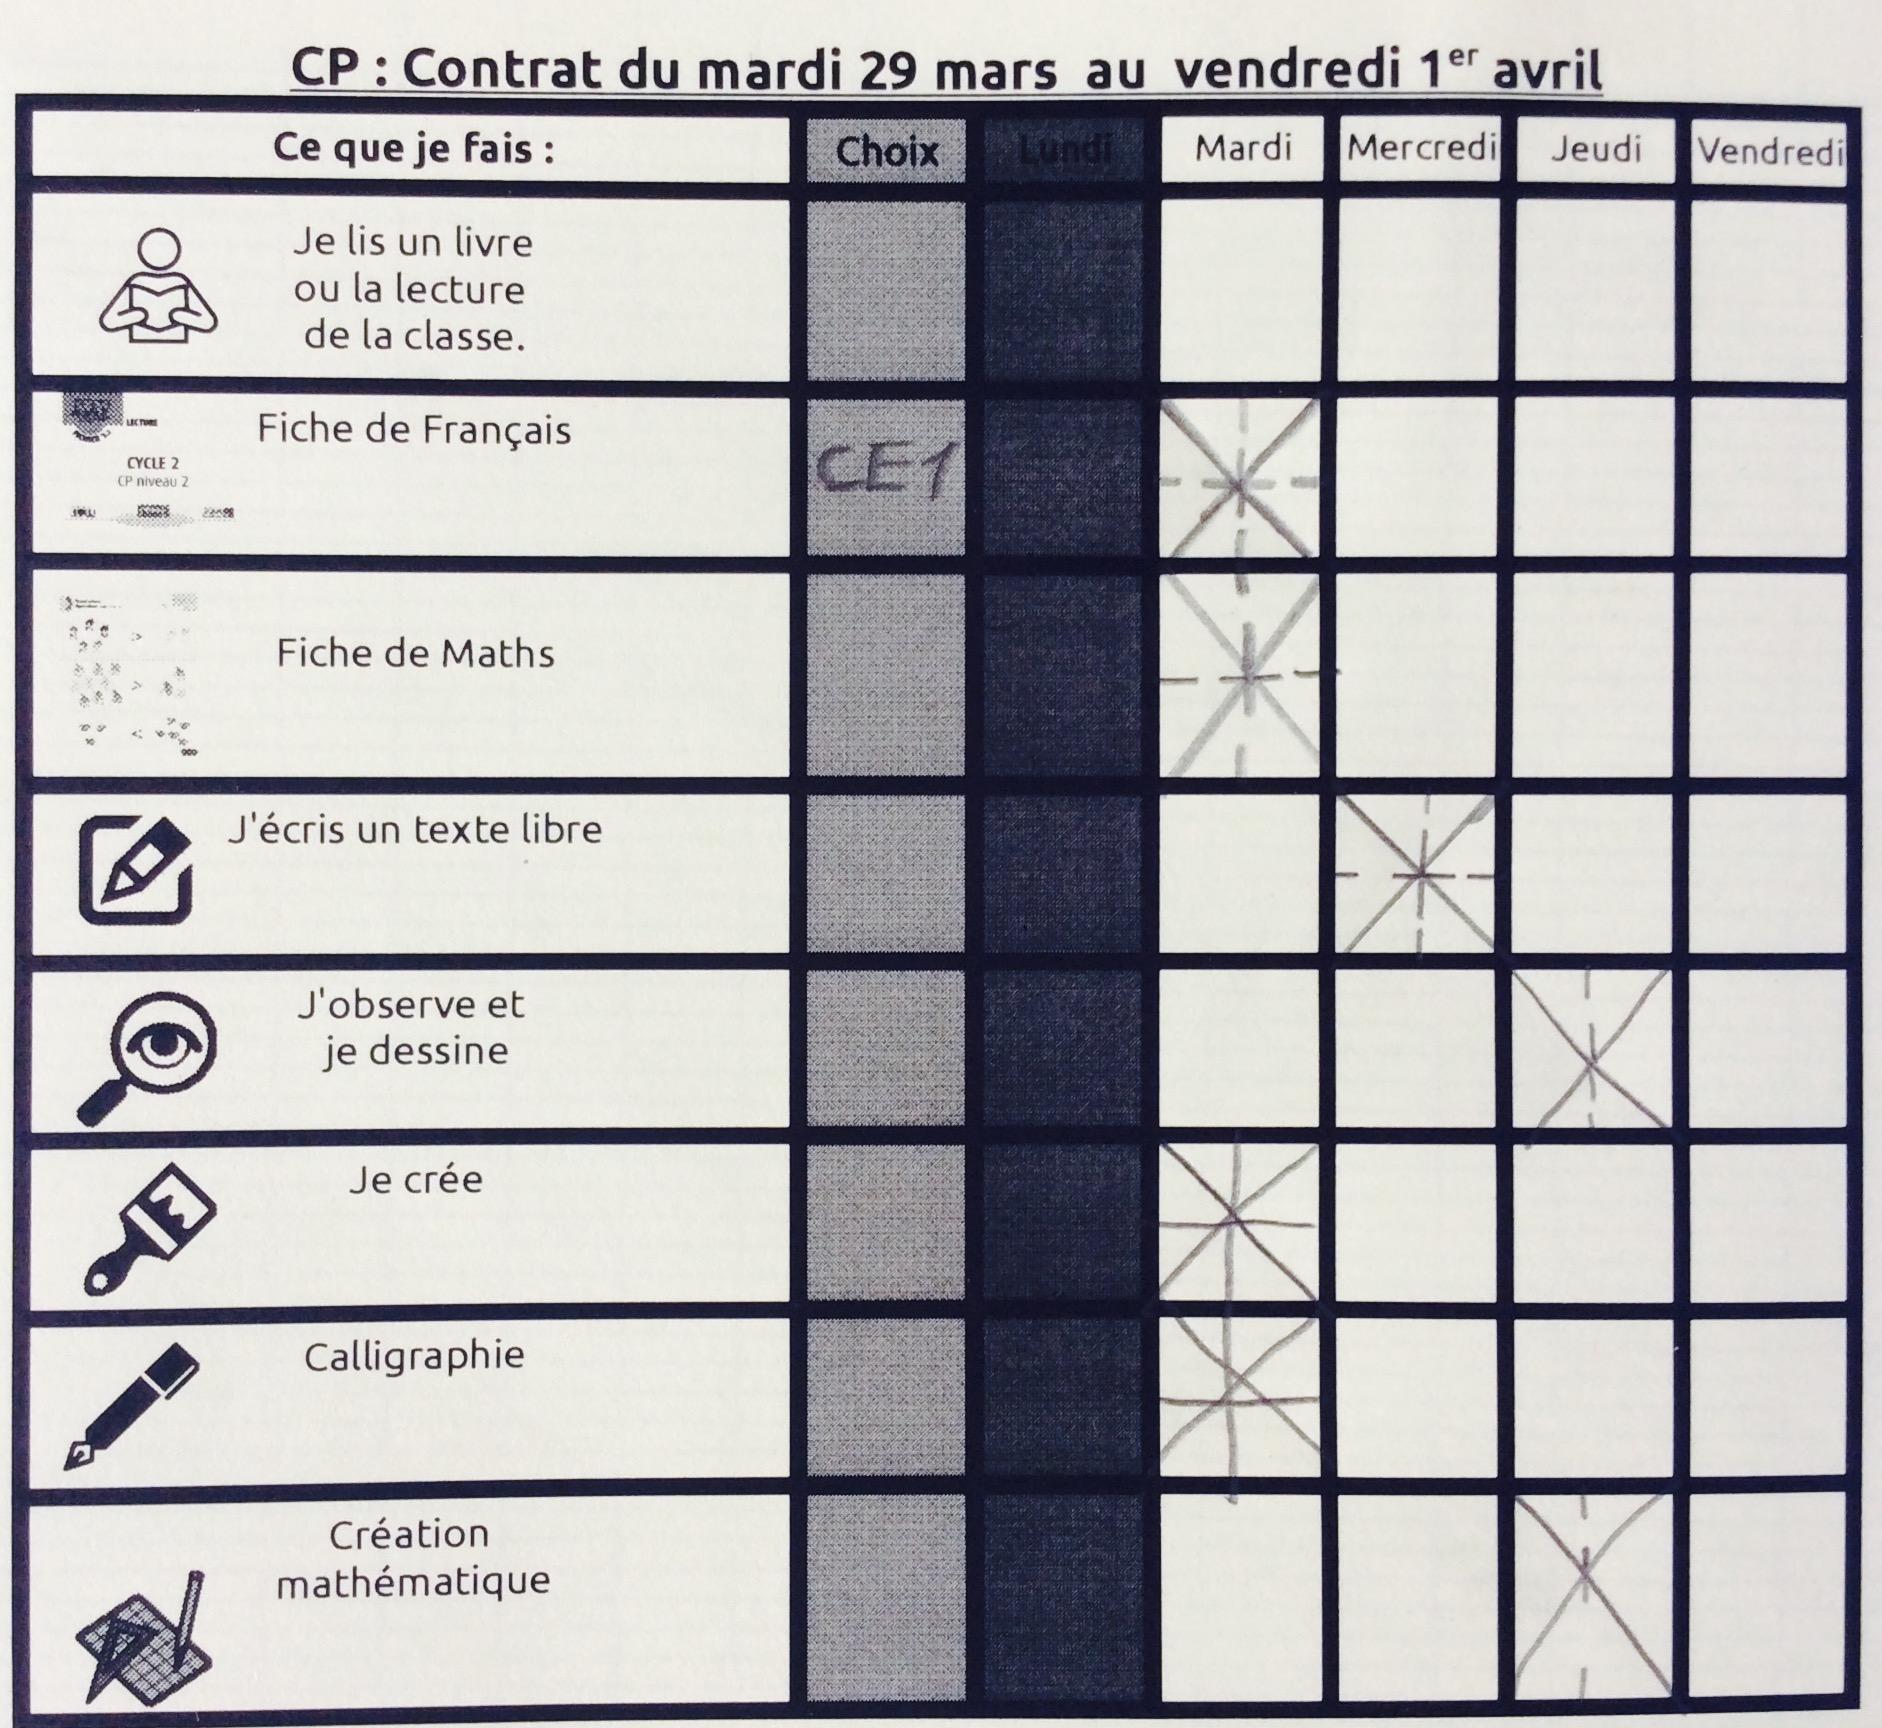 ContratCP